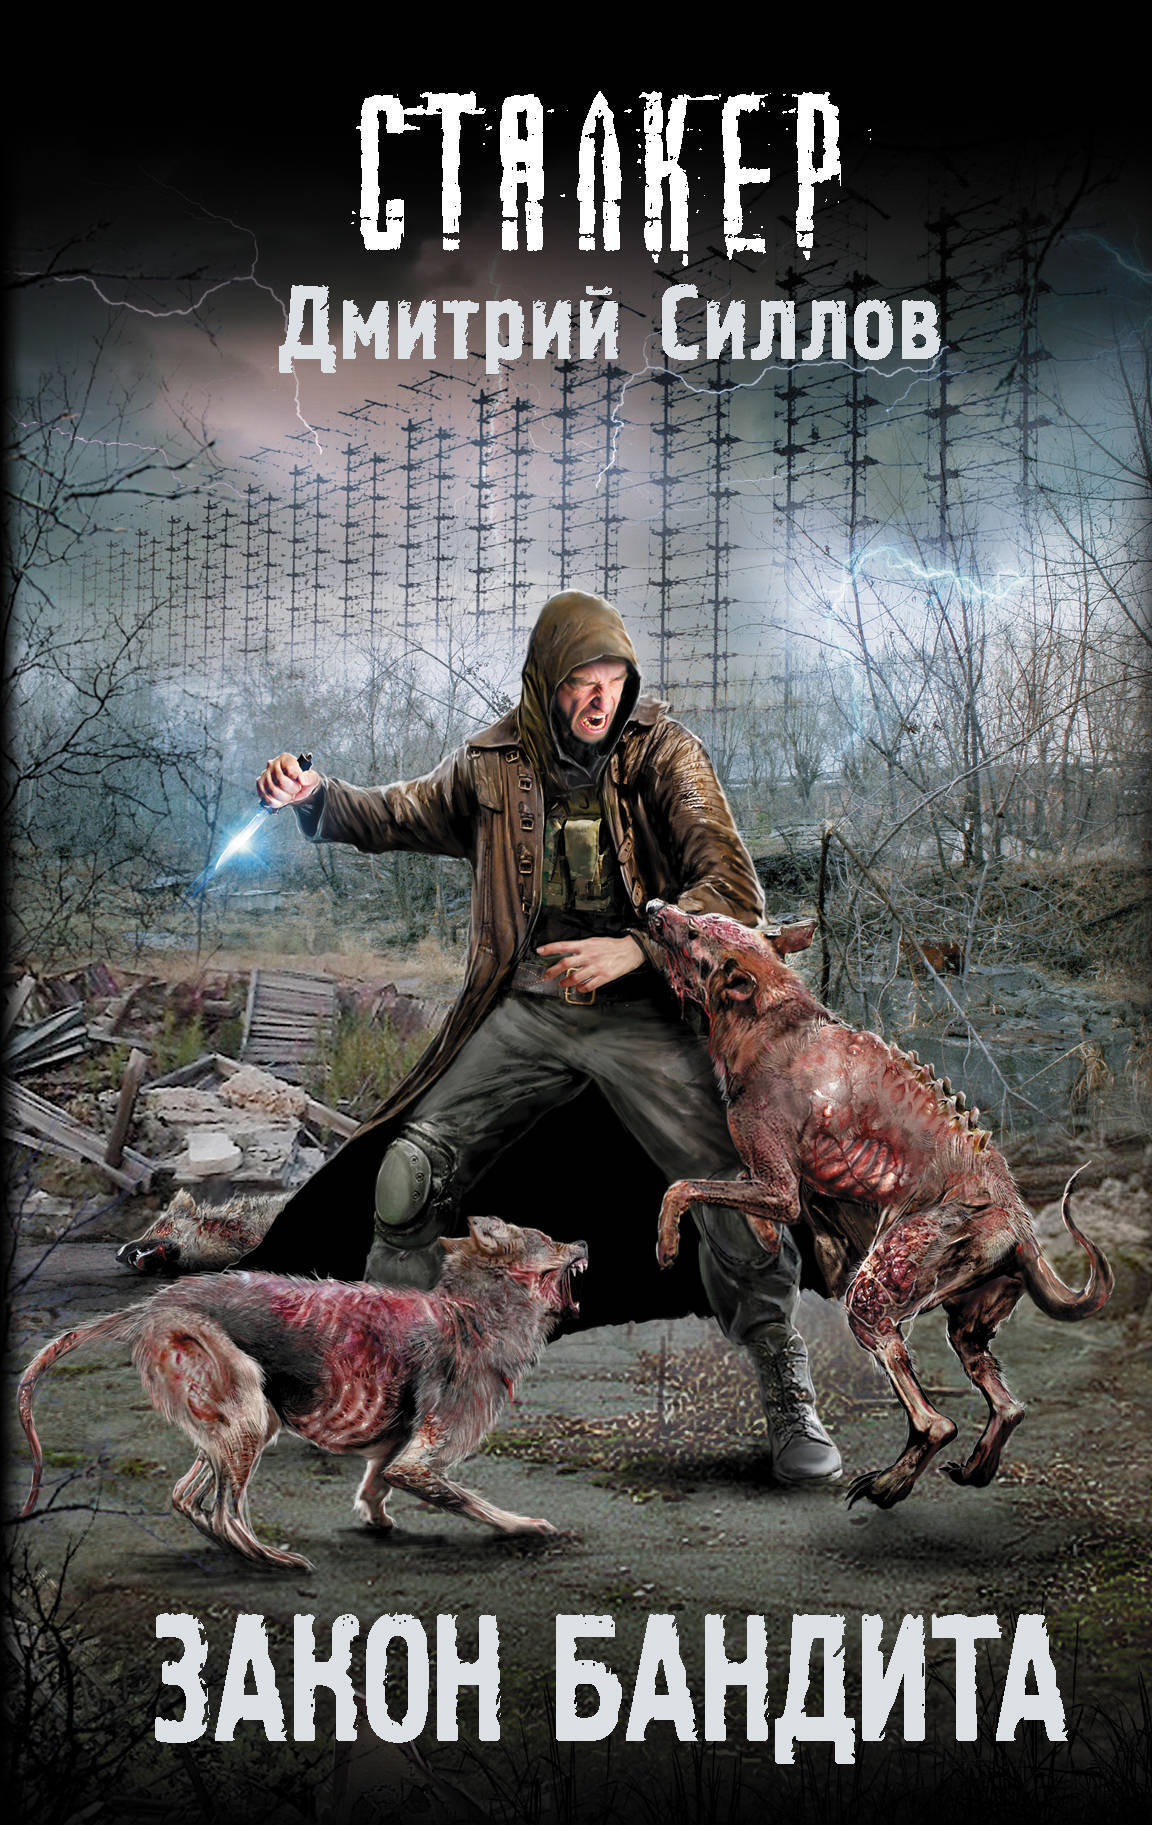 Закон бандита | Силлов Дмитрий Олегович